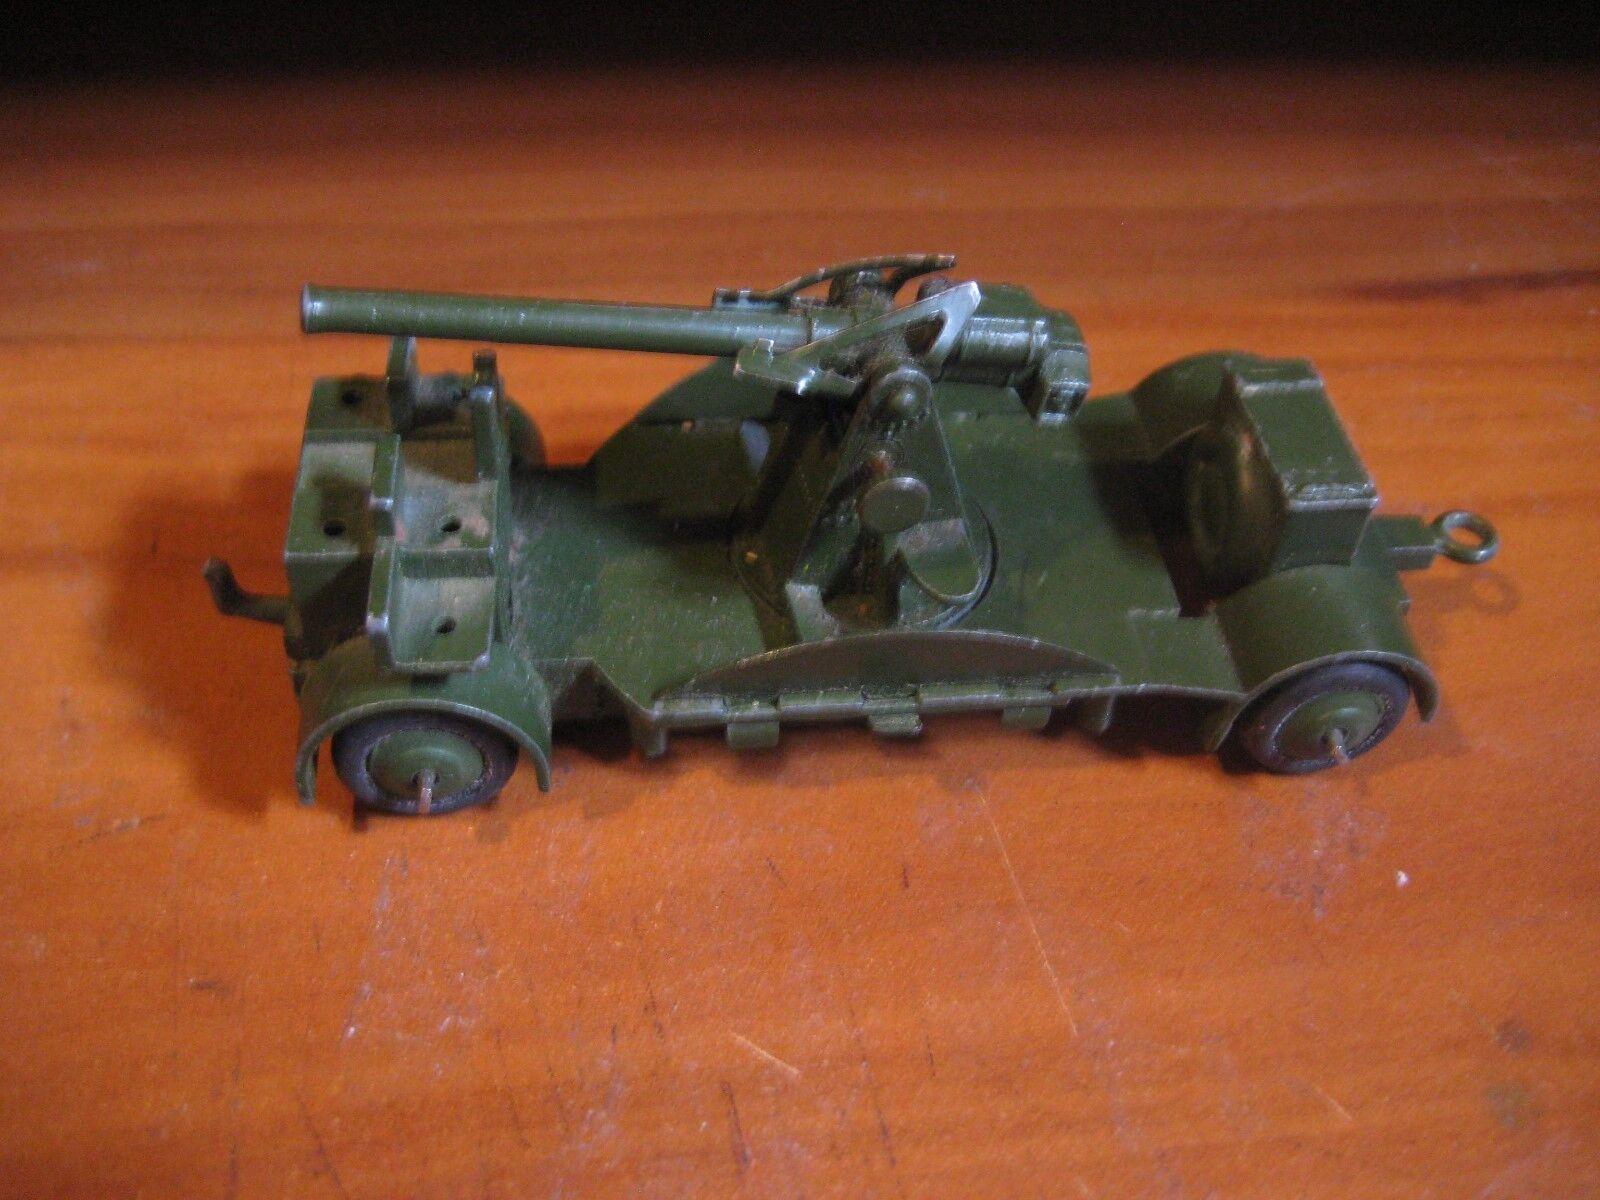 Dinky Juguetes 690 cañón antiaéreo con ruedas de goma por Meccano